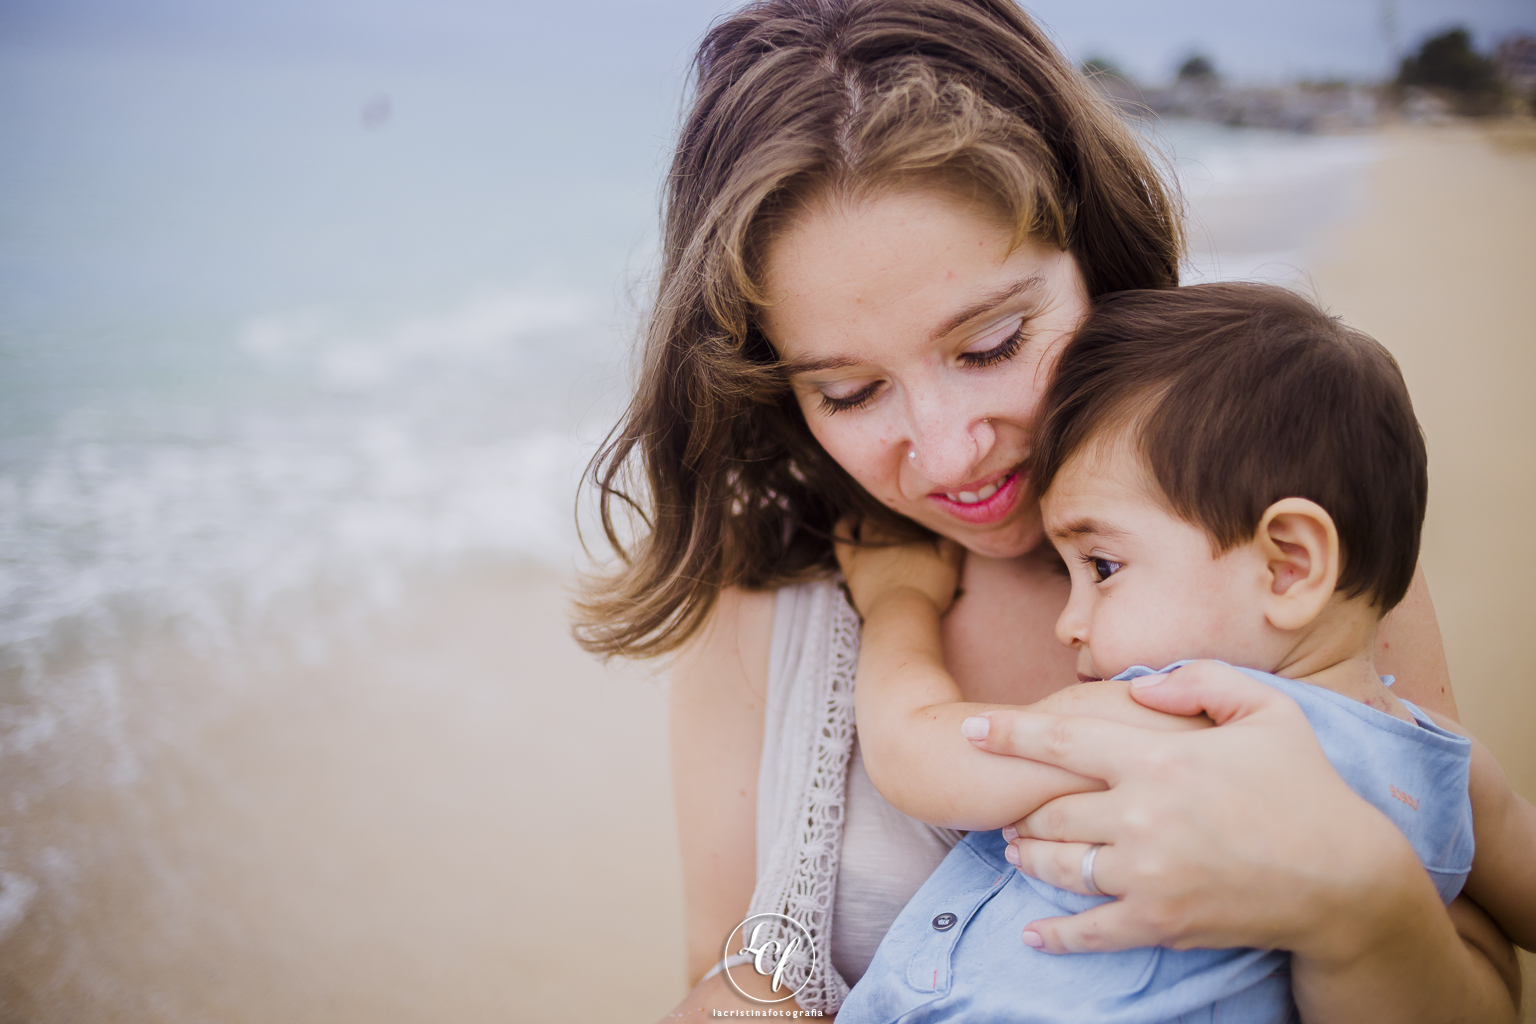 Fotógrafo de familia Barcelona :: Premià de mar :: Fotografía infantil :: Fotógrafo familiar :: fotografía familiar :: niños en la playa :: fotografía en la playa